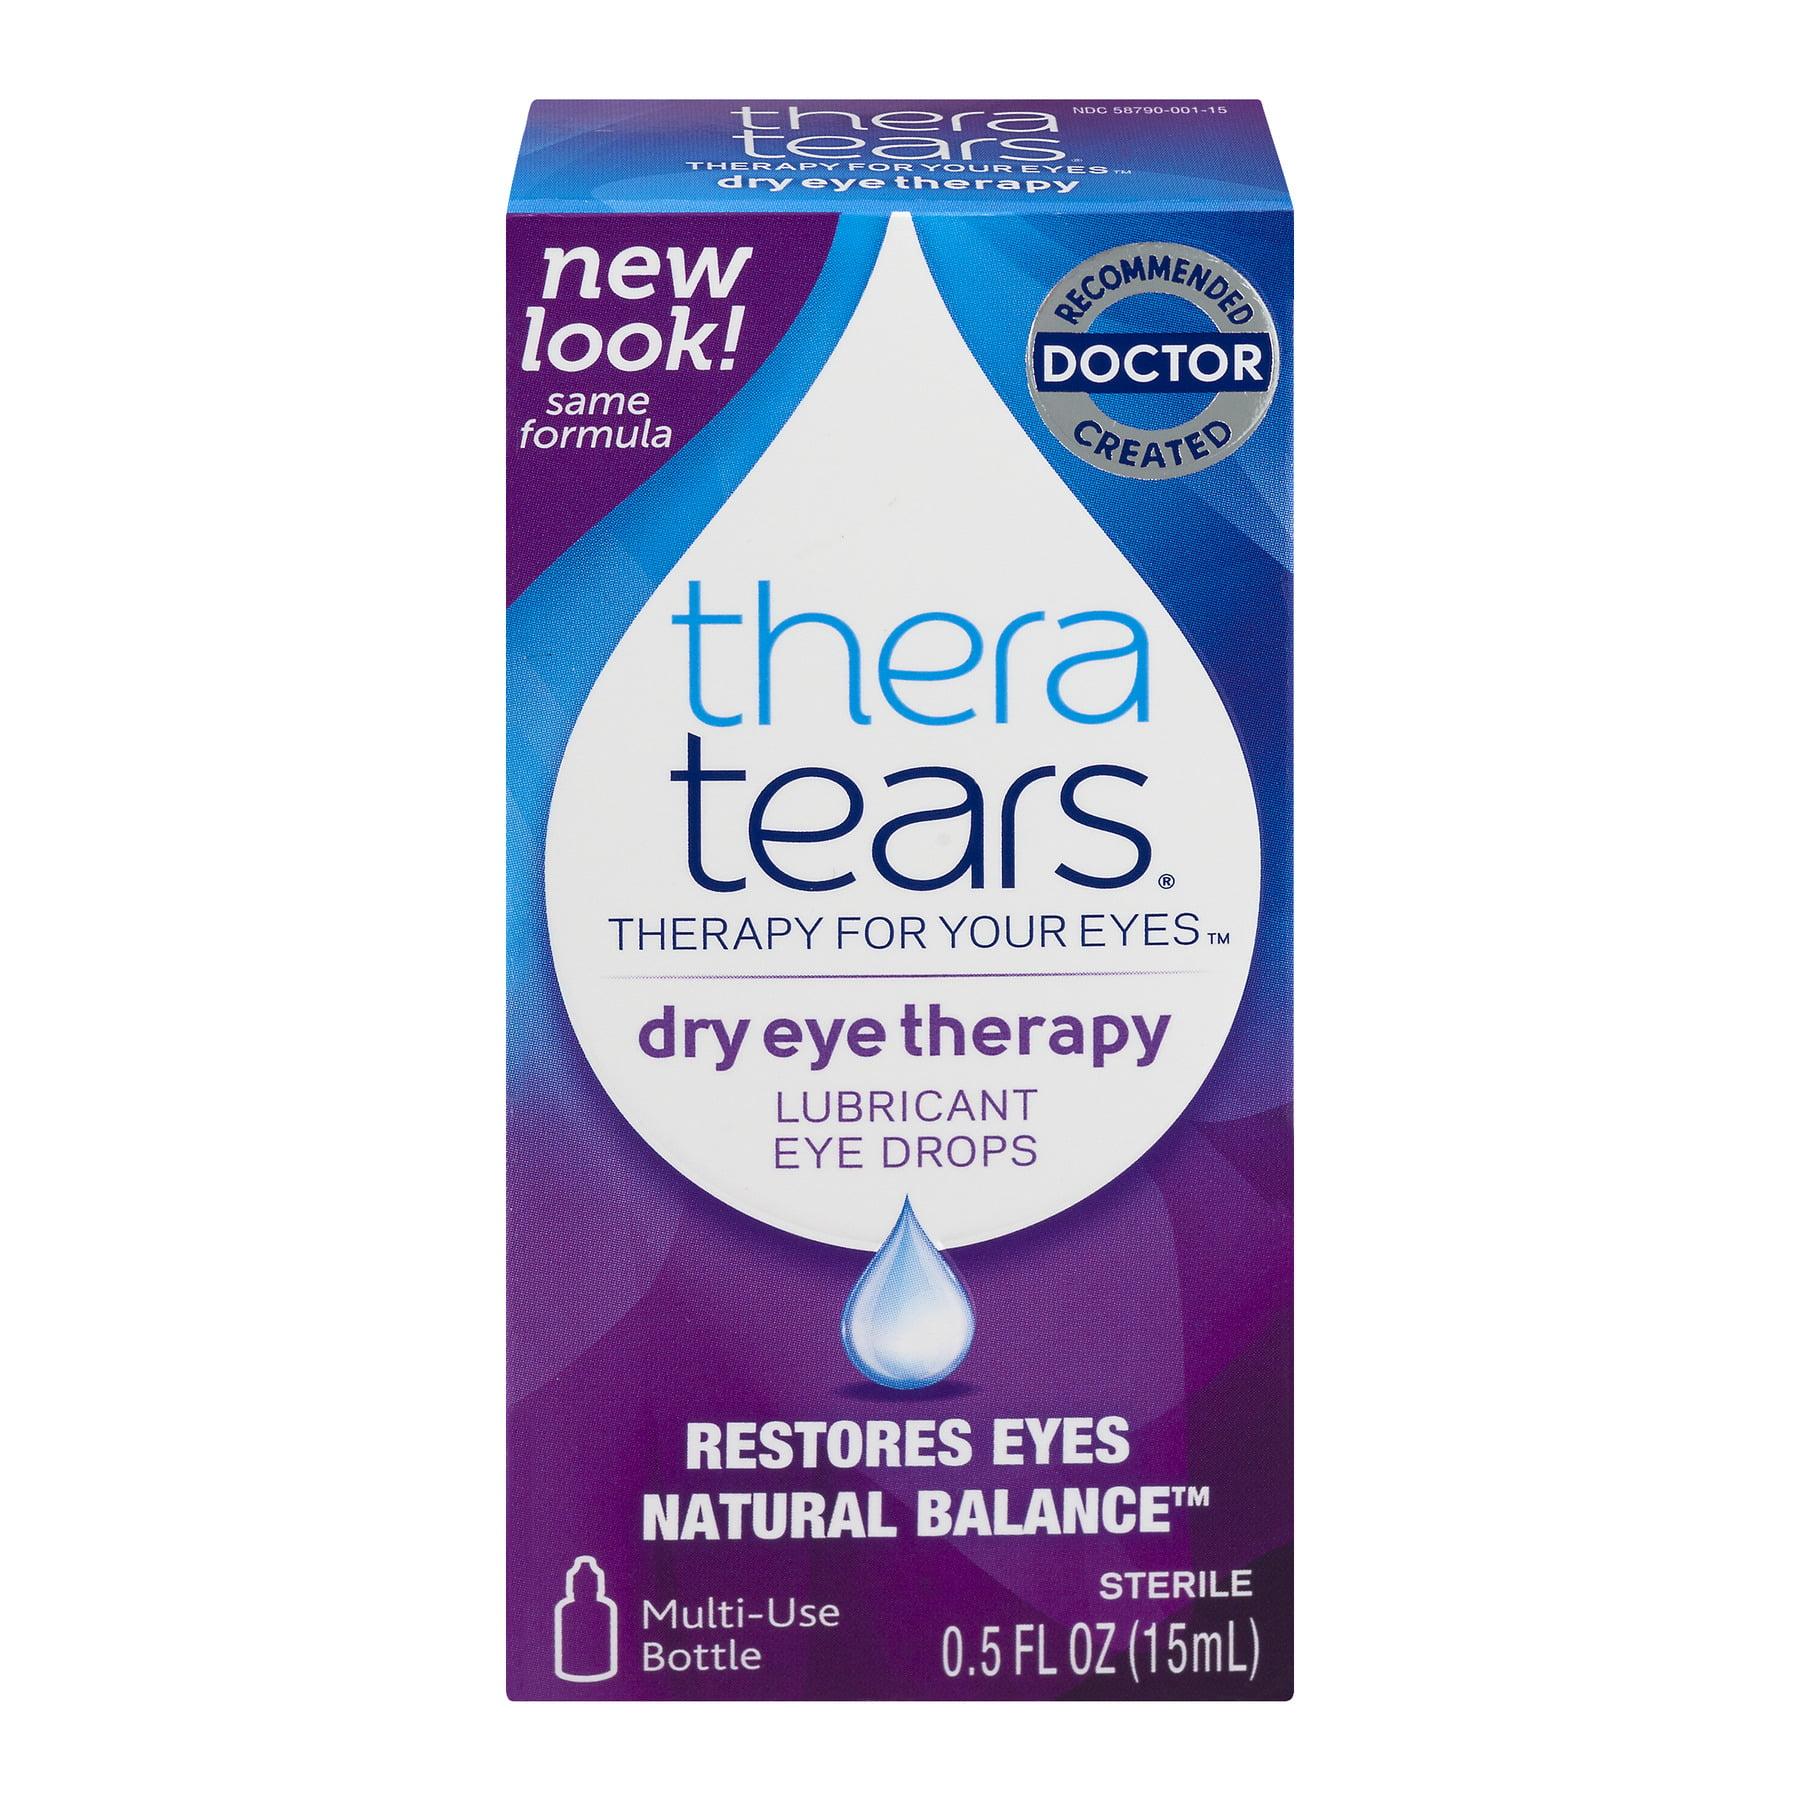 Thera Tears Dry Eyes Therapy Lubricant Eye Drops, 0.5 FL OZ